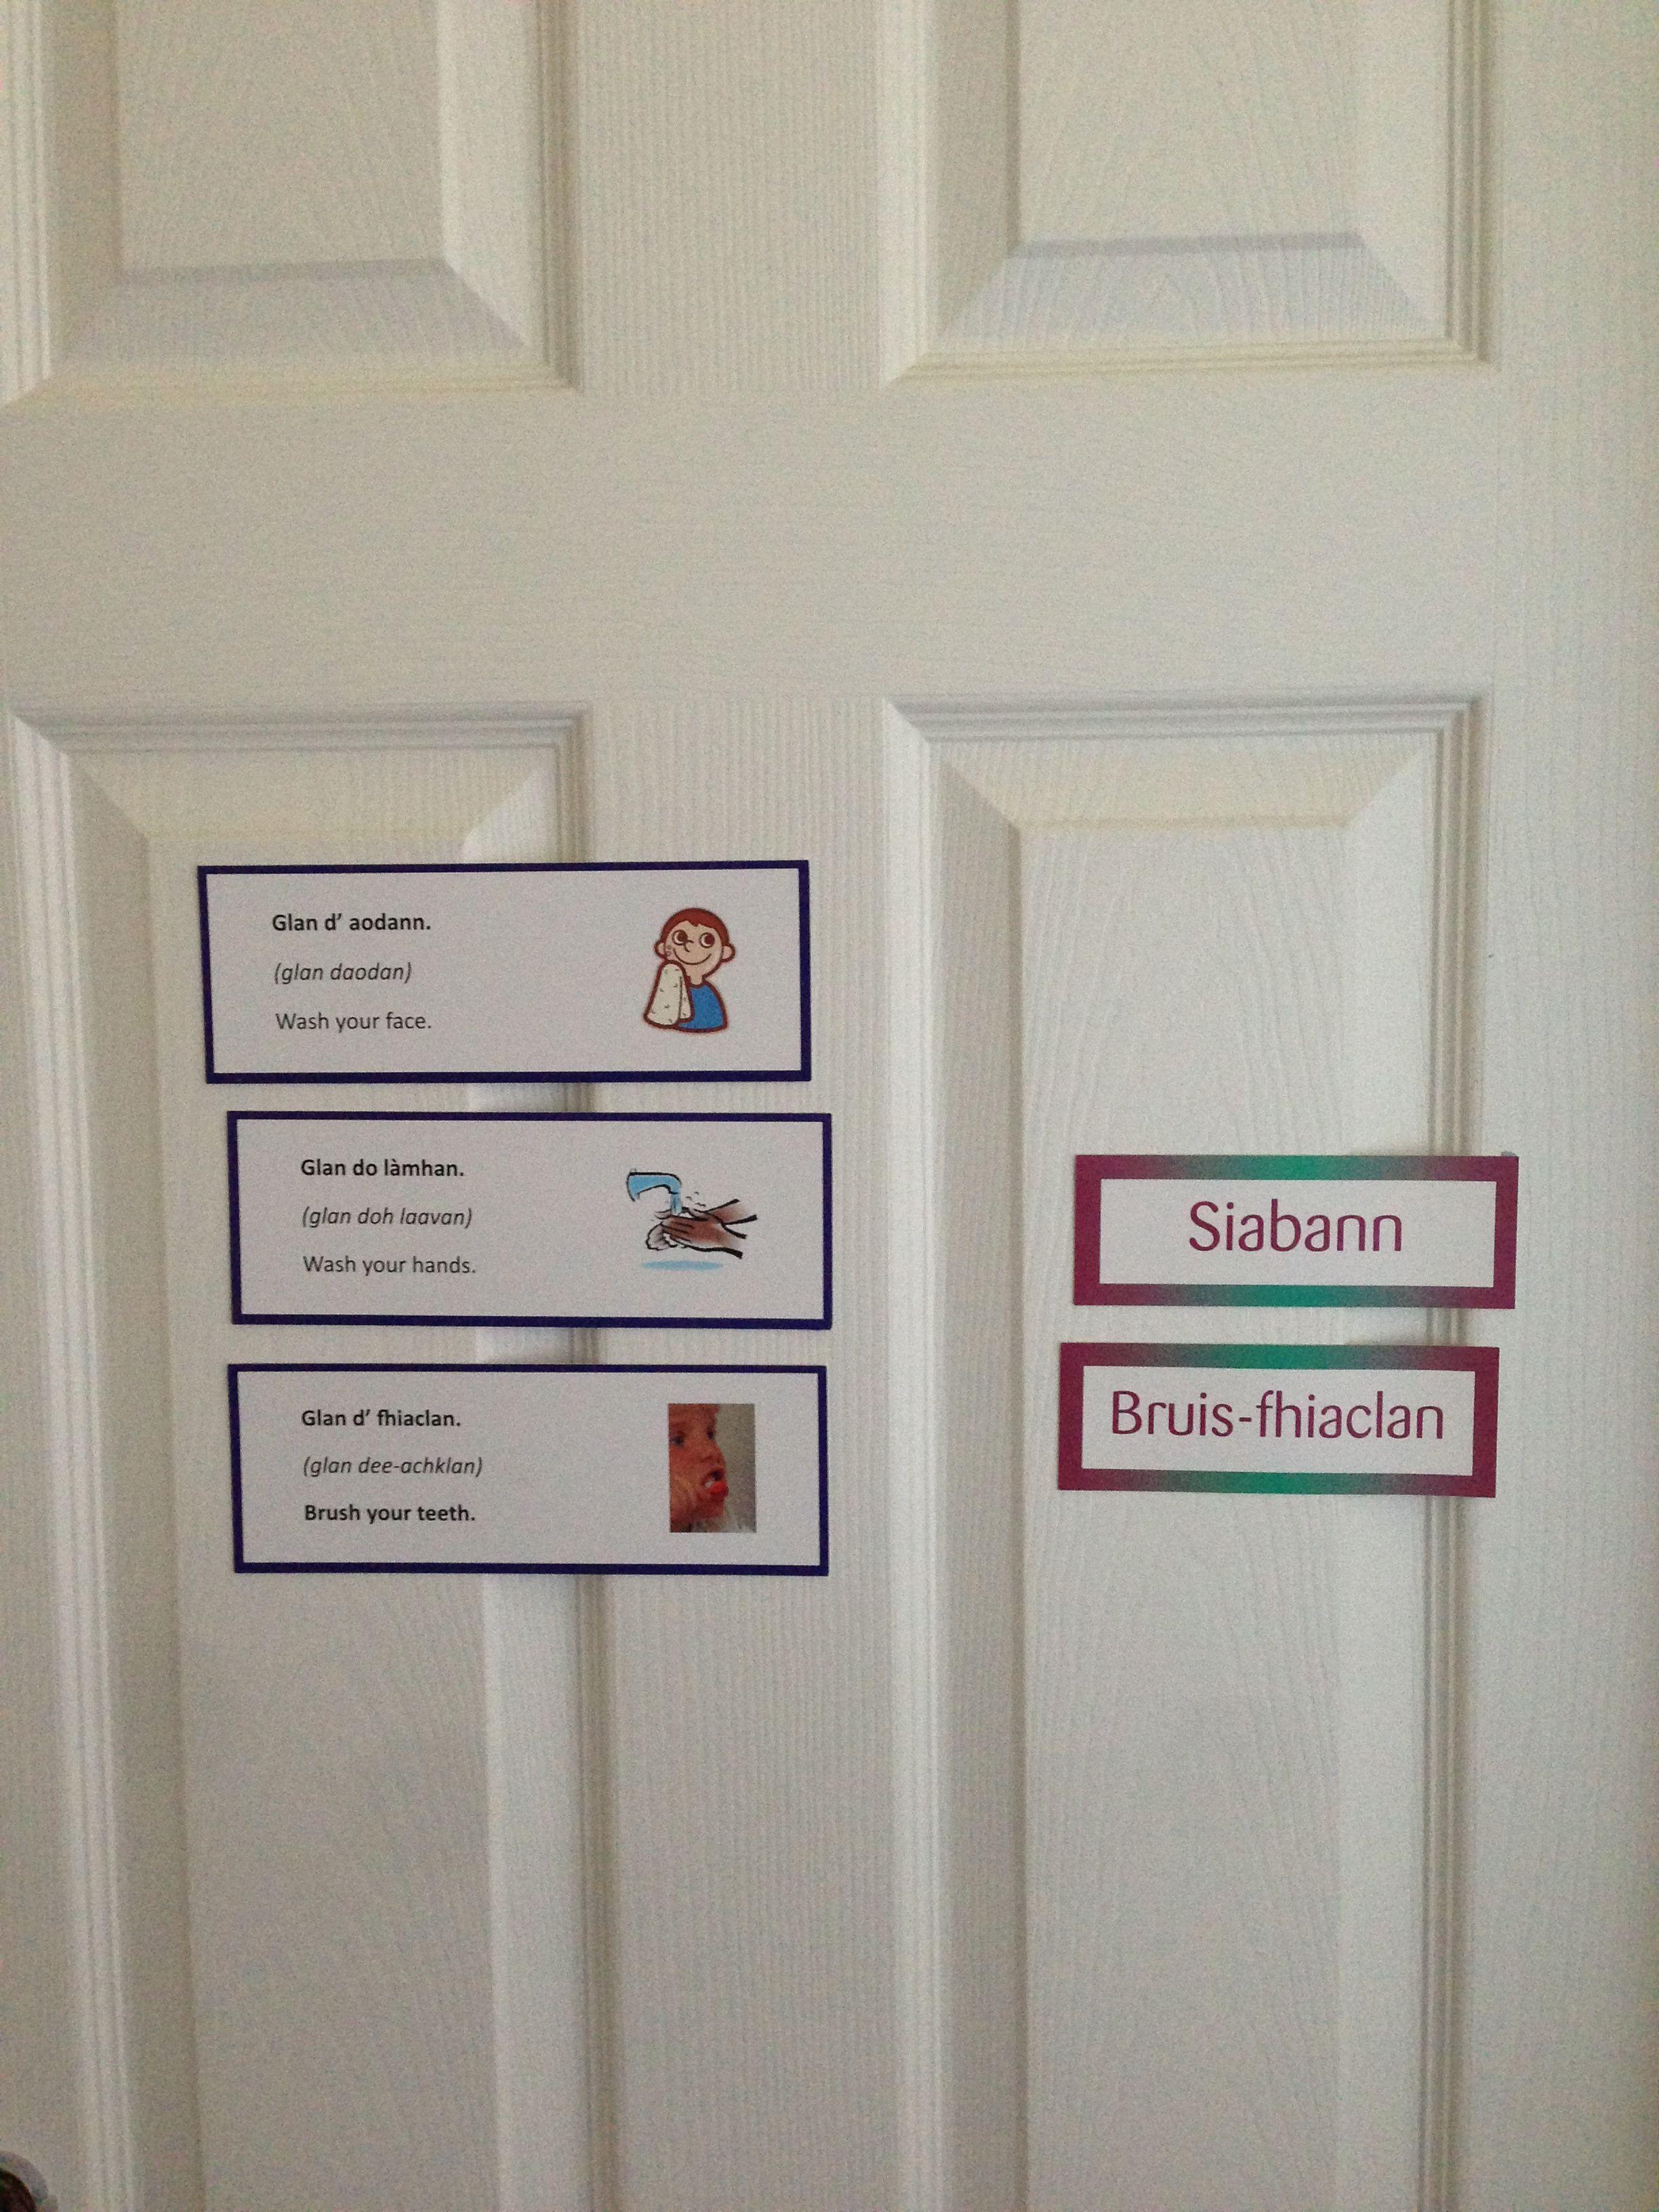 My Bathroom Door Scottish Gaelic Gaelic Wash Your Face